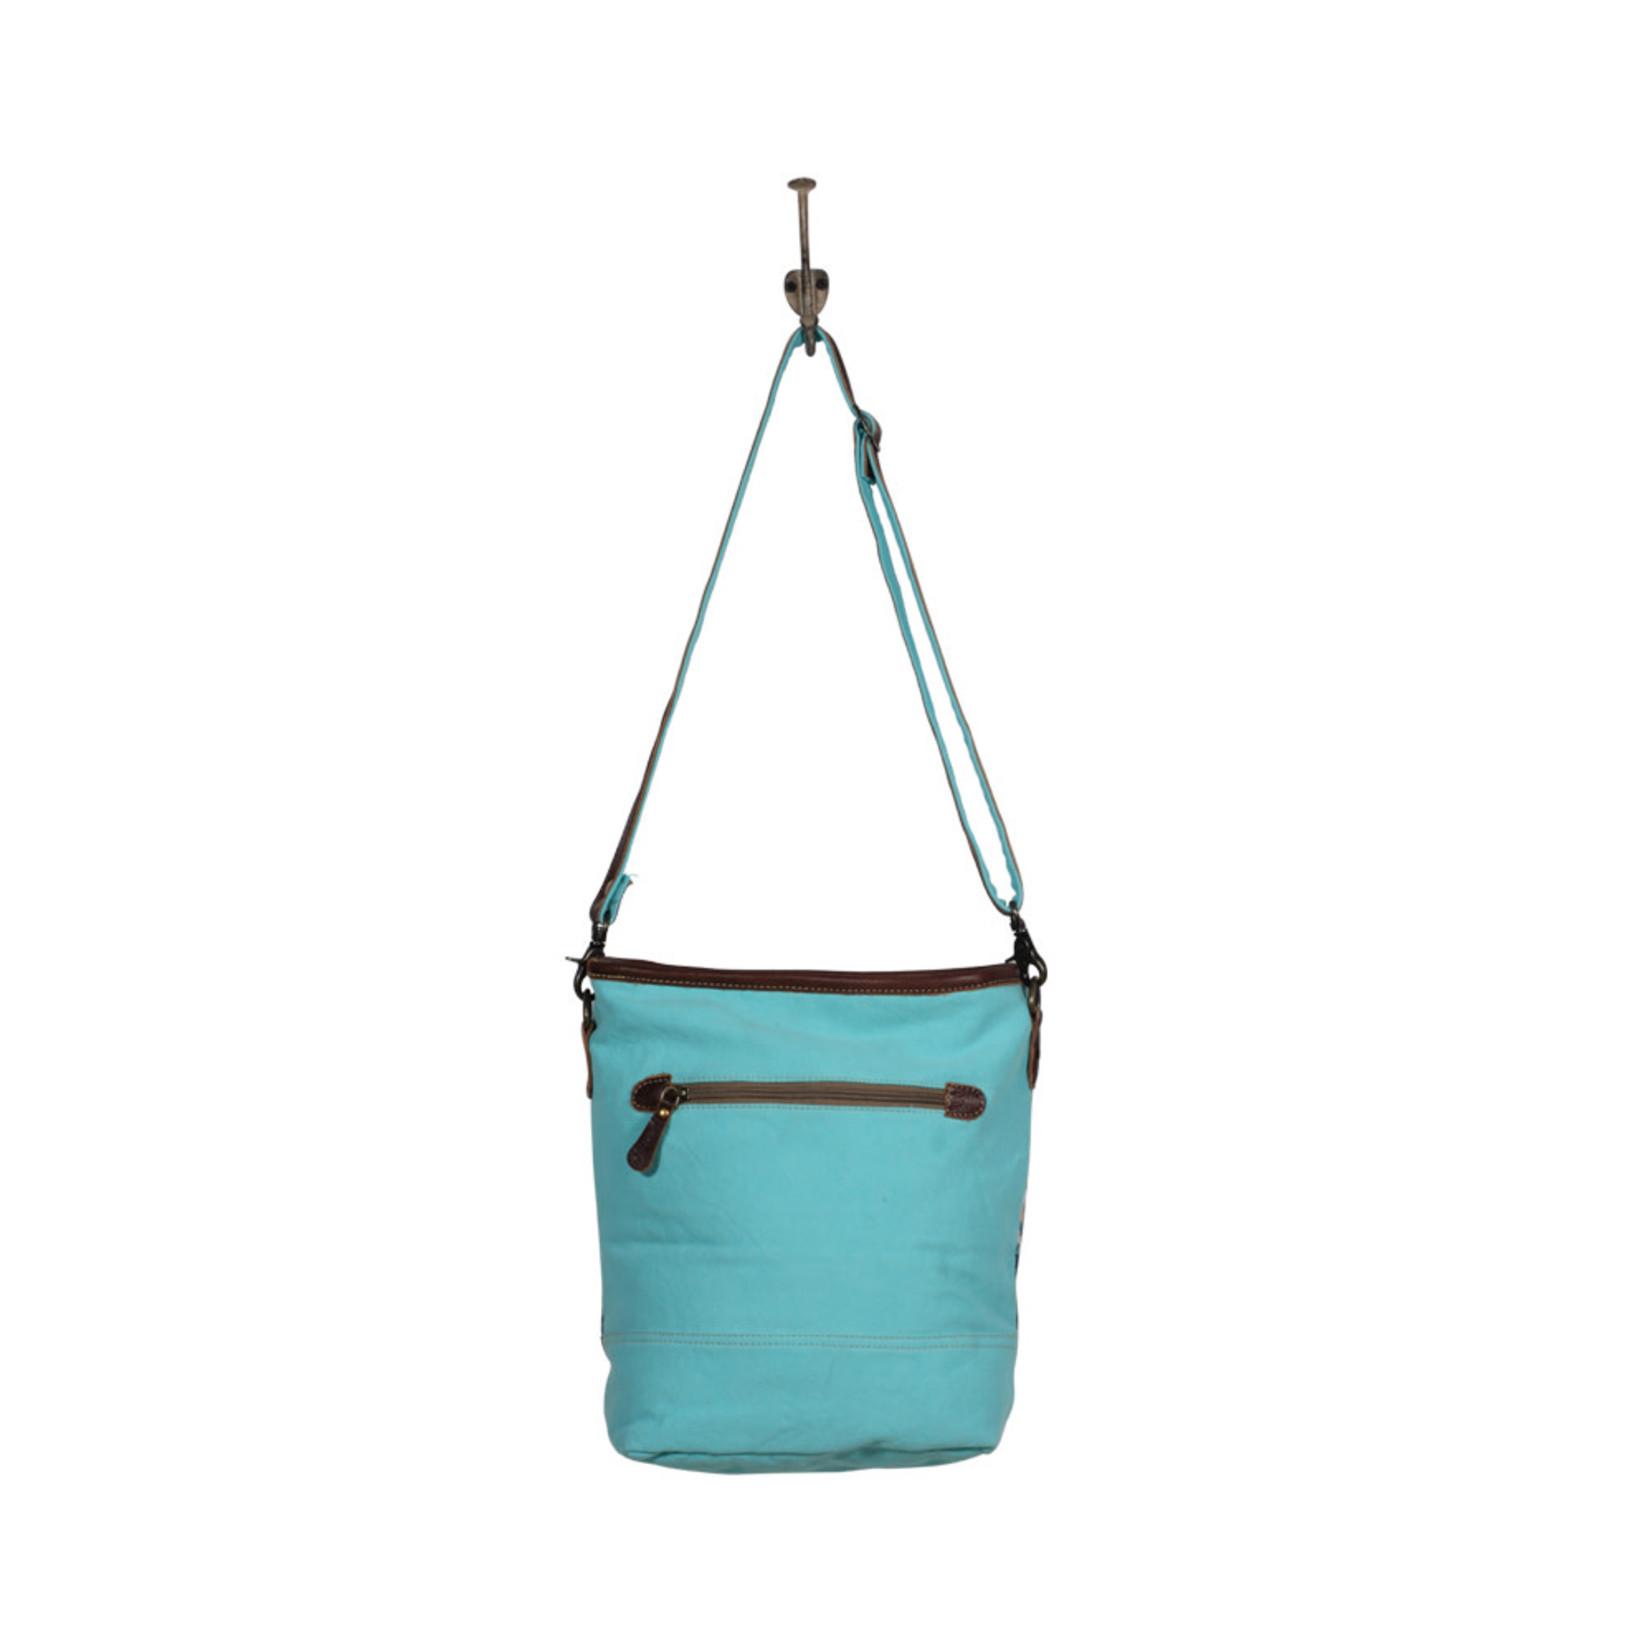 Myra Bags S-2061 Spirited Shoulder Bag